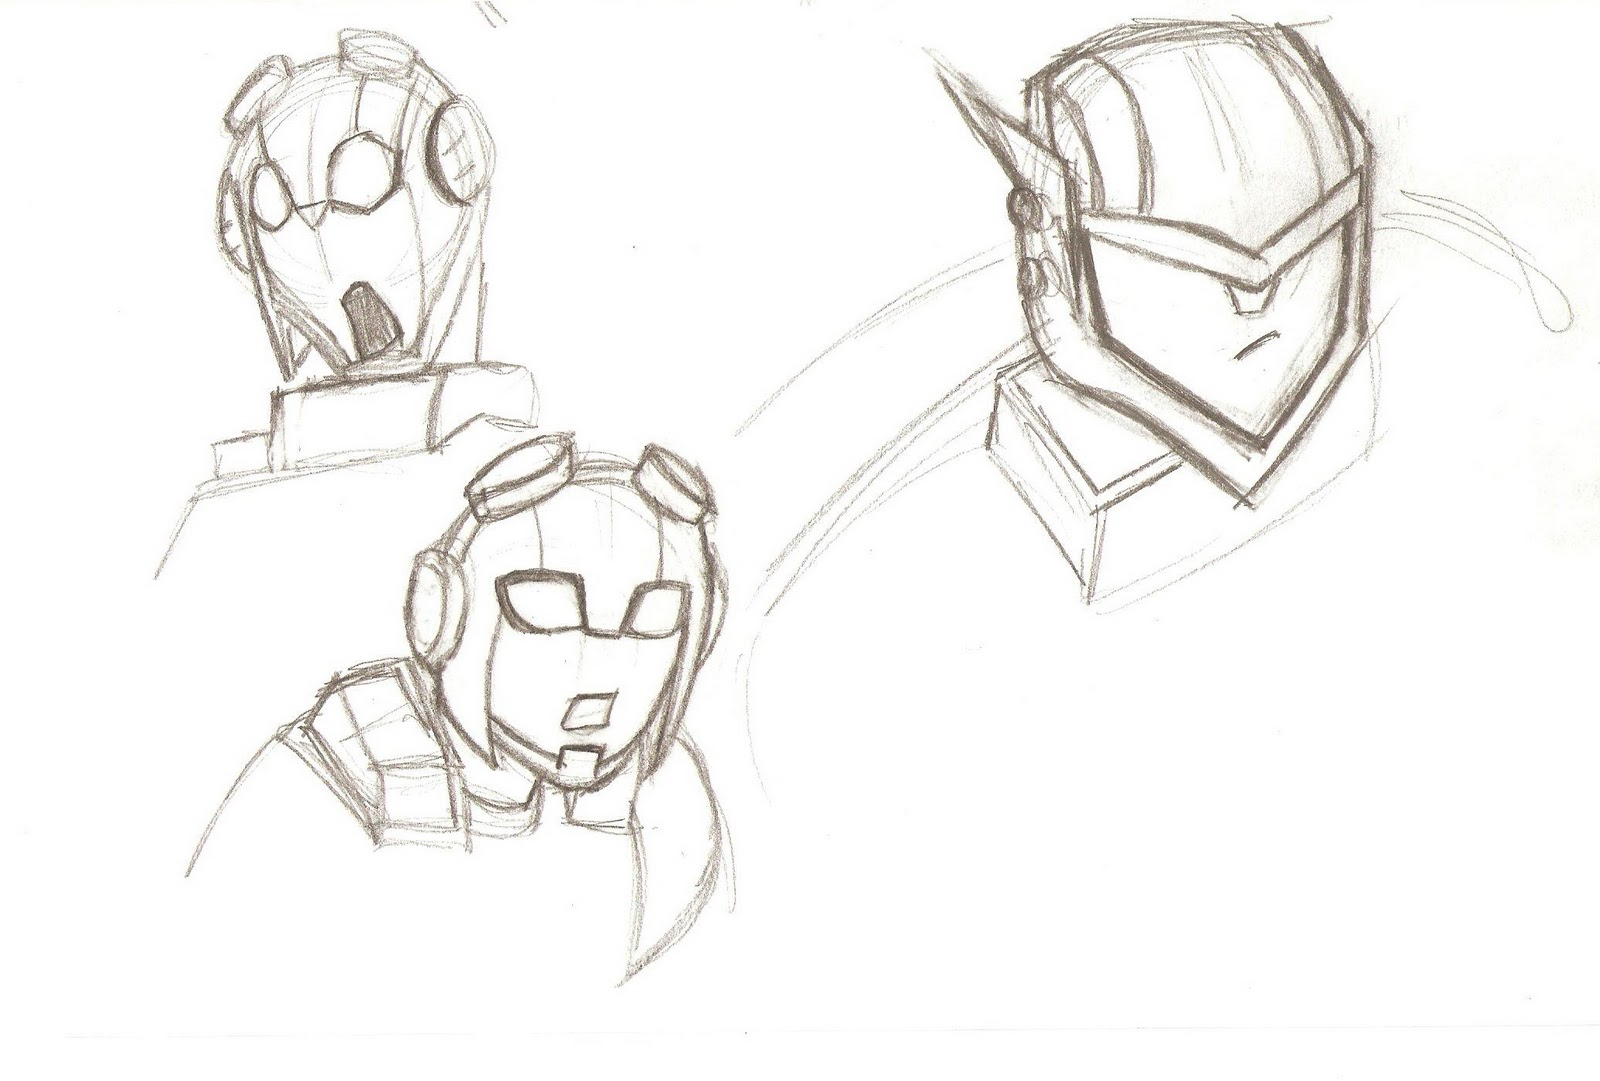 Work In Progress: Jetfire and Jetstorm sketch 1